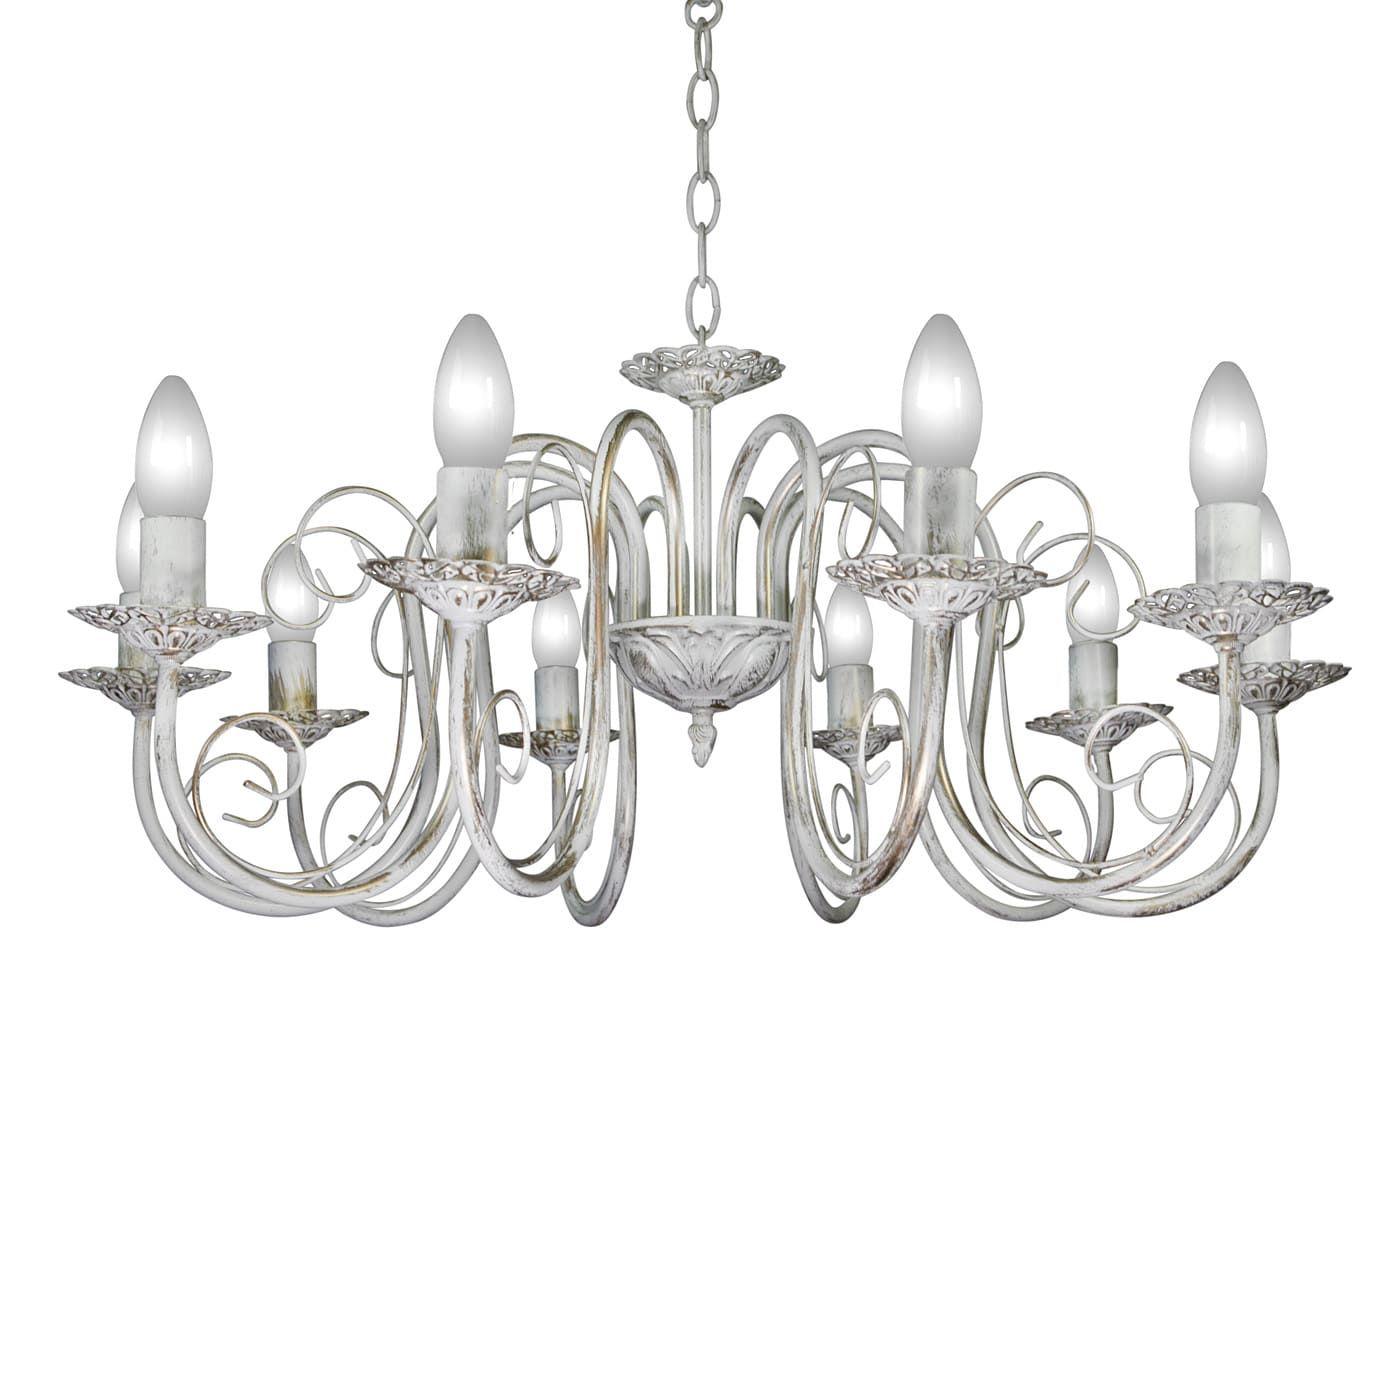 PETRASVET / Pendant chandelier S1170-10, 10xE14 max. 60W